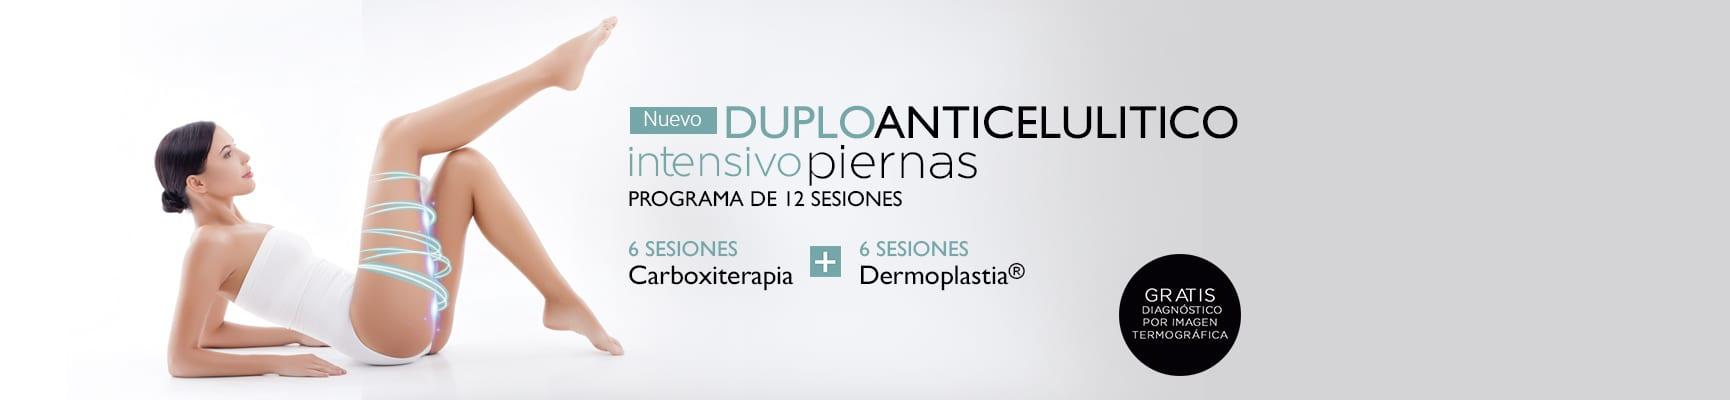 Duplo Anticelulitico Clínicas Zurich